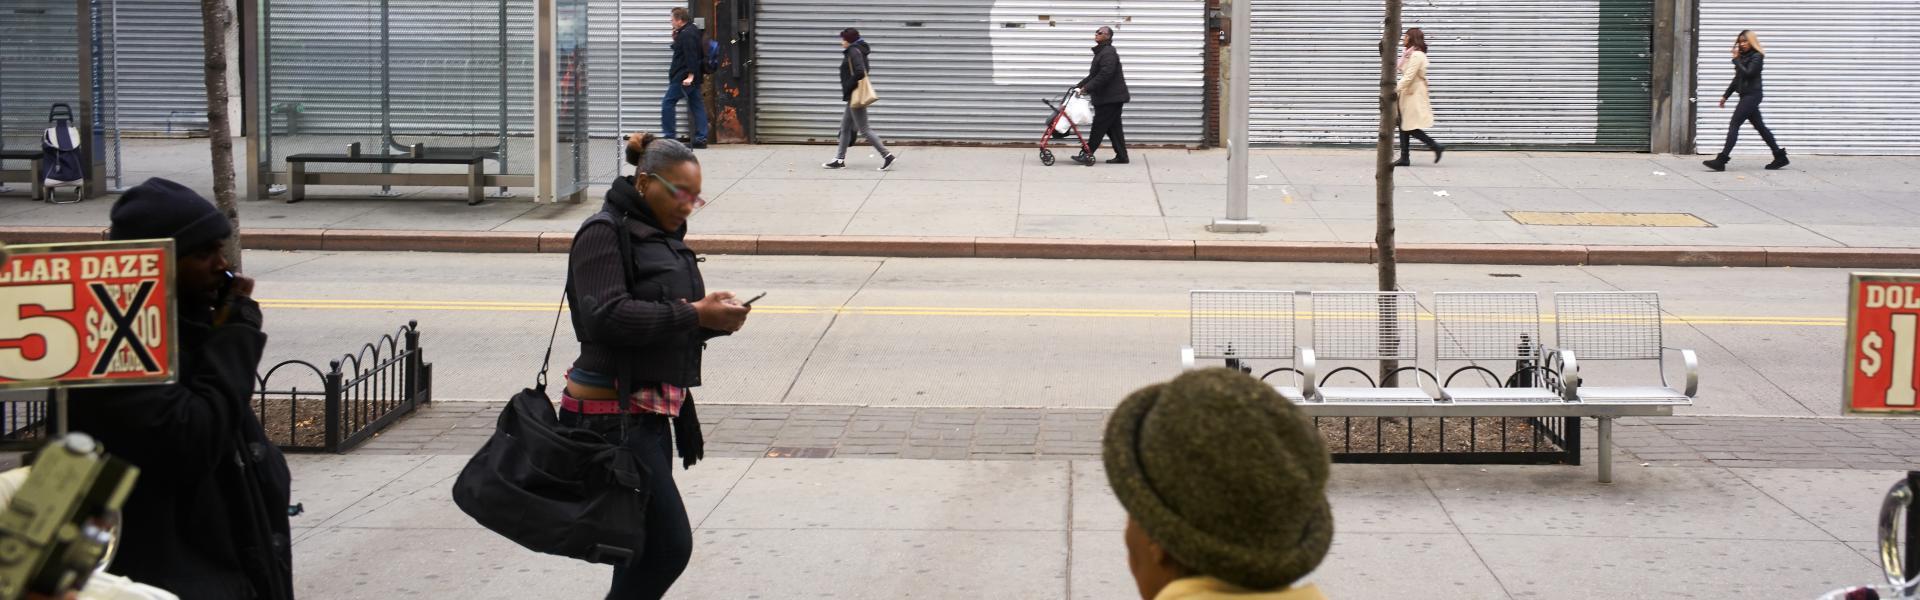 Downtown Brooklyn, NYC, street scene, Gus Powell